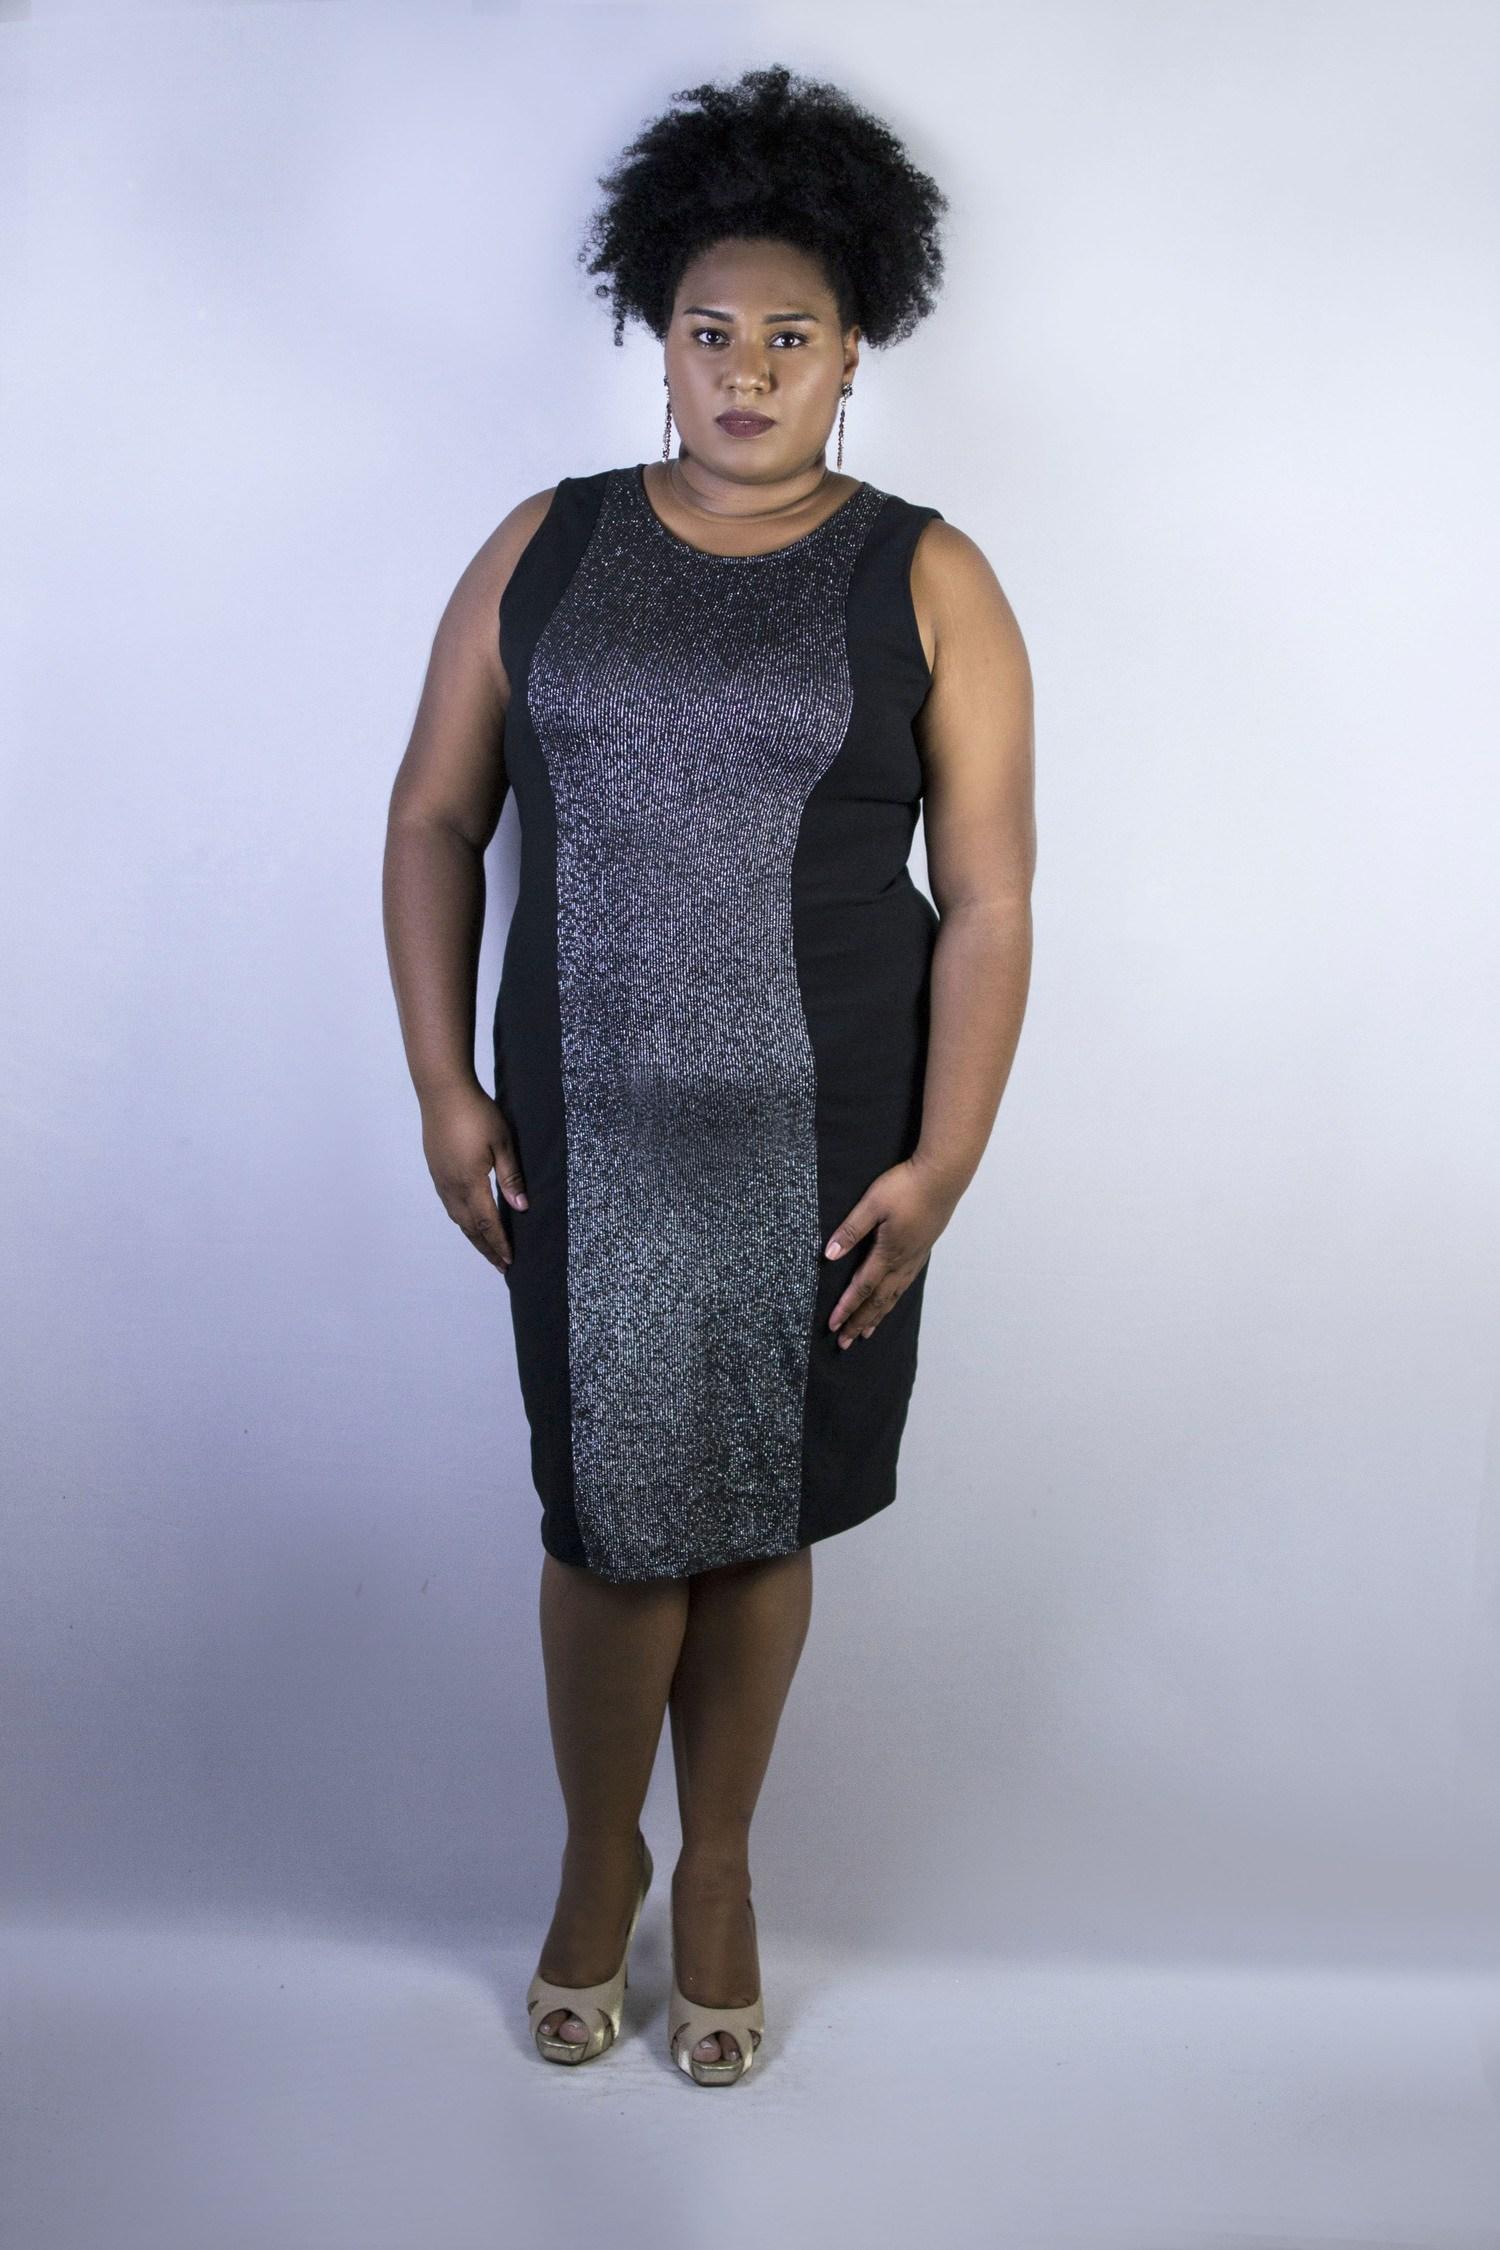 Vestido Com Recortes De Brilho Preto